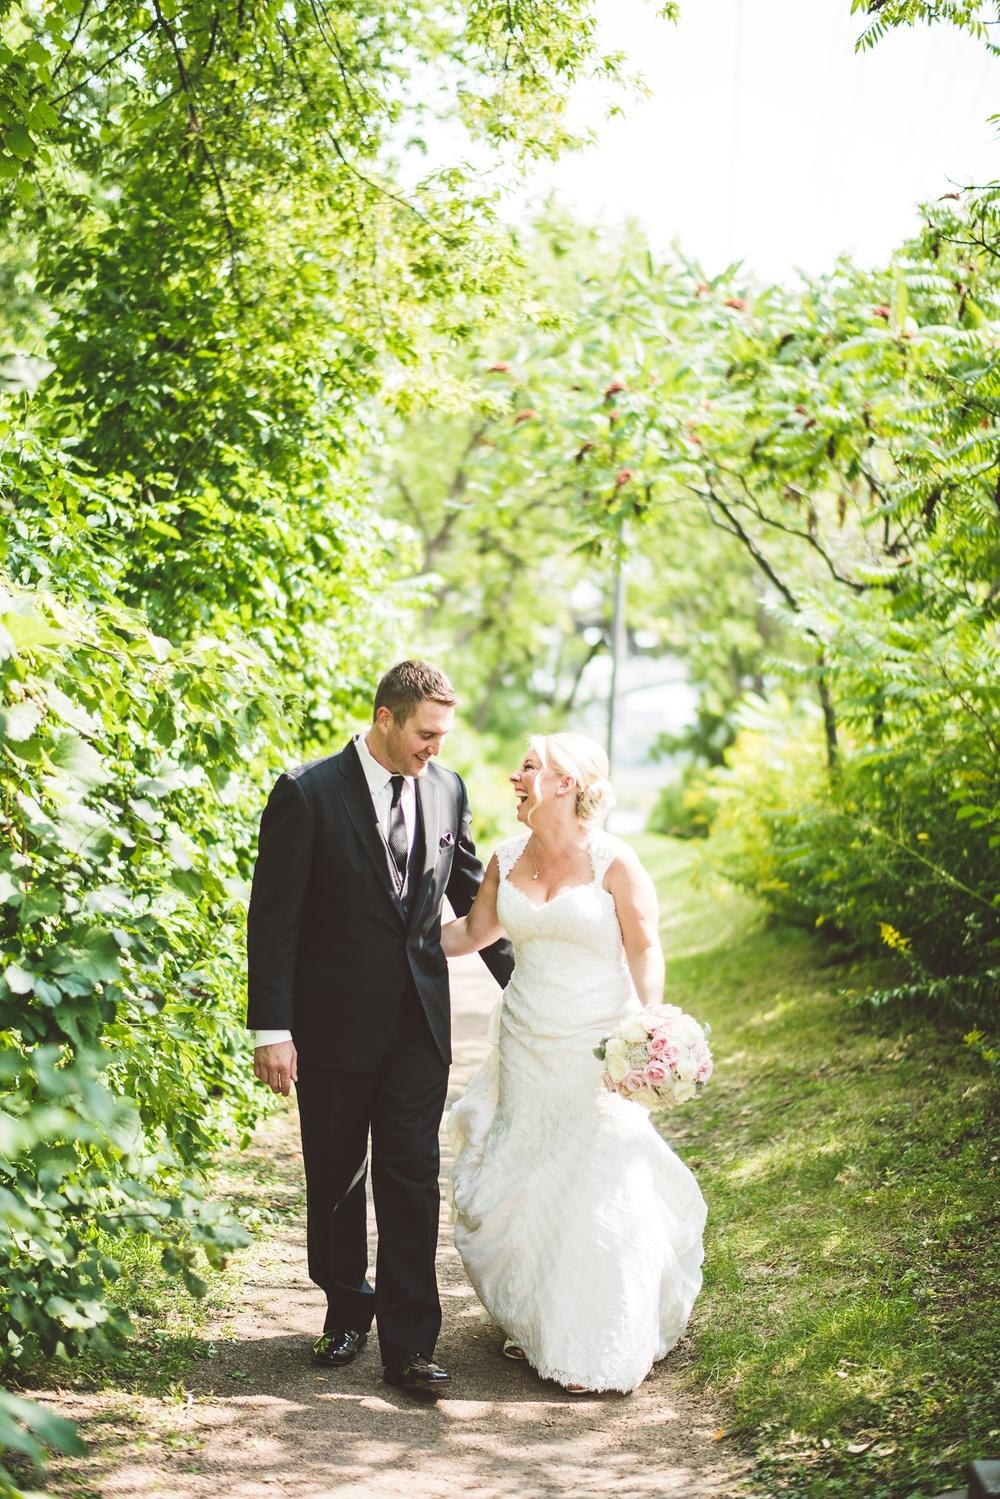 Best_wedding_photos_Minneapolis_minnesota_lucas_botz_photographty_83.jpg